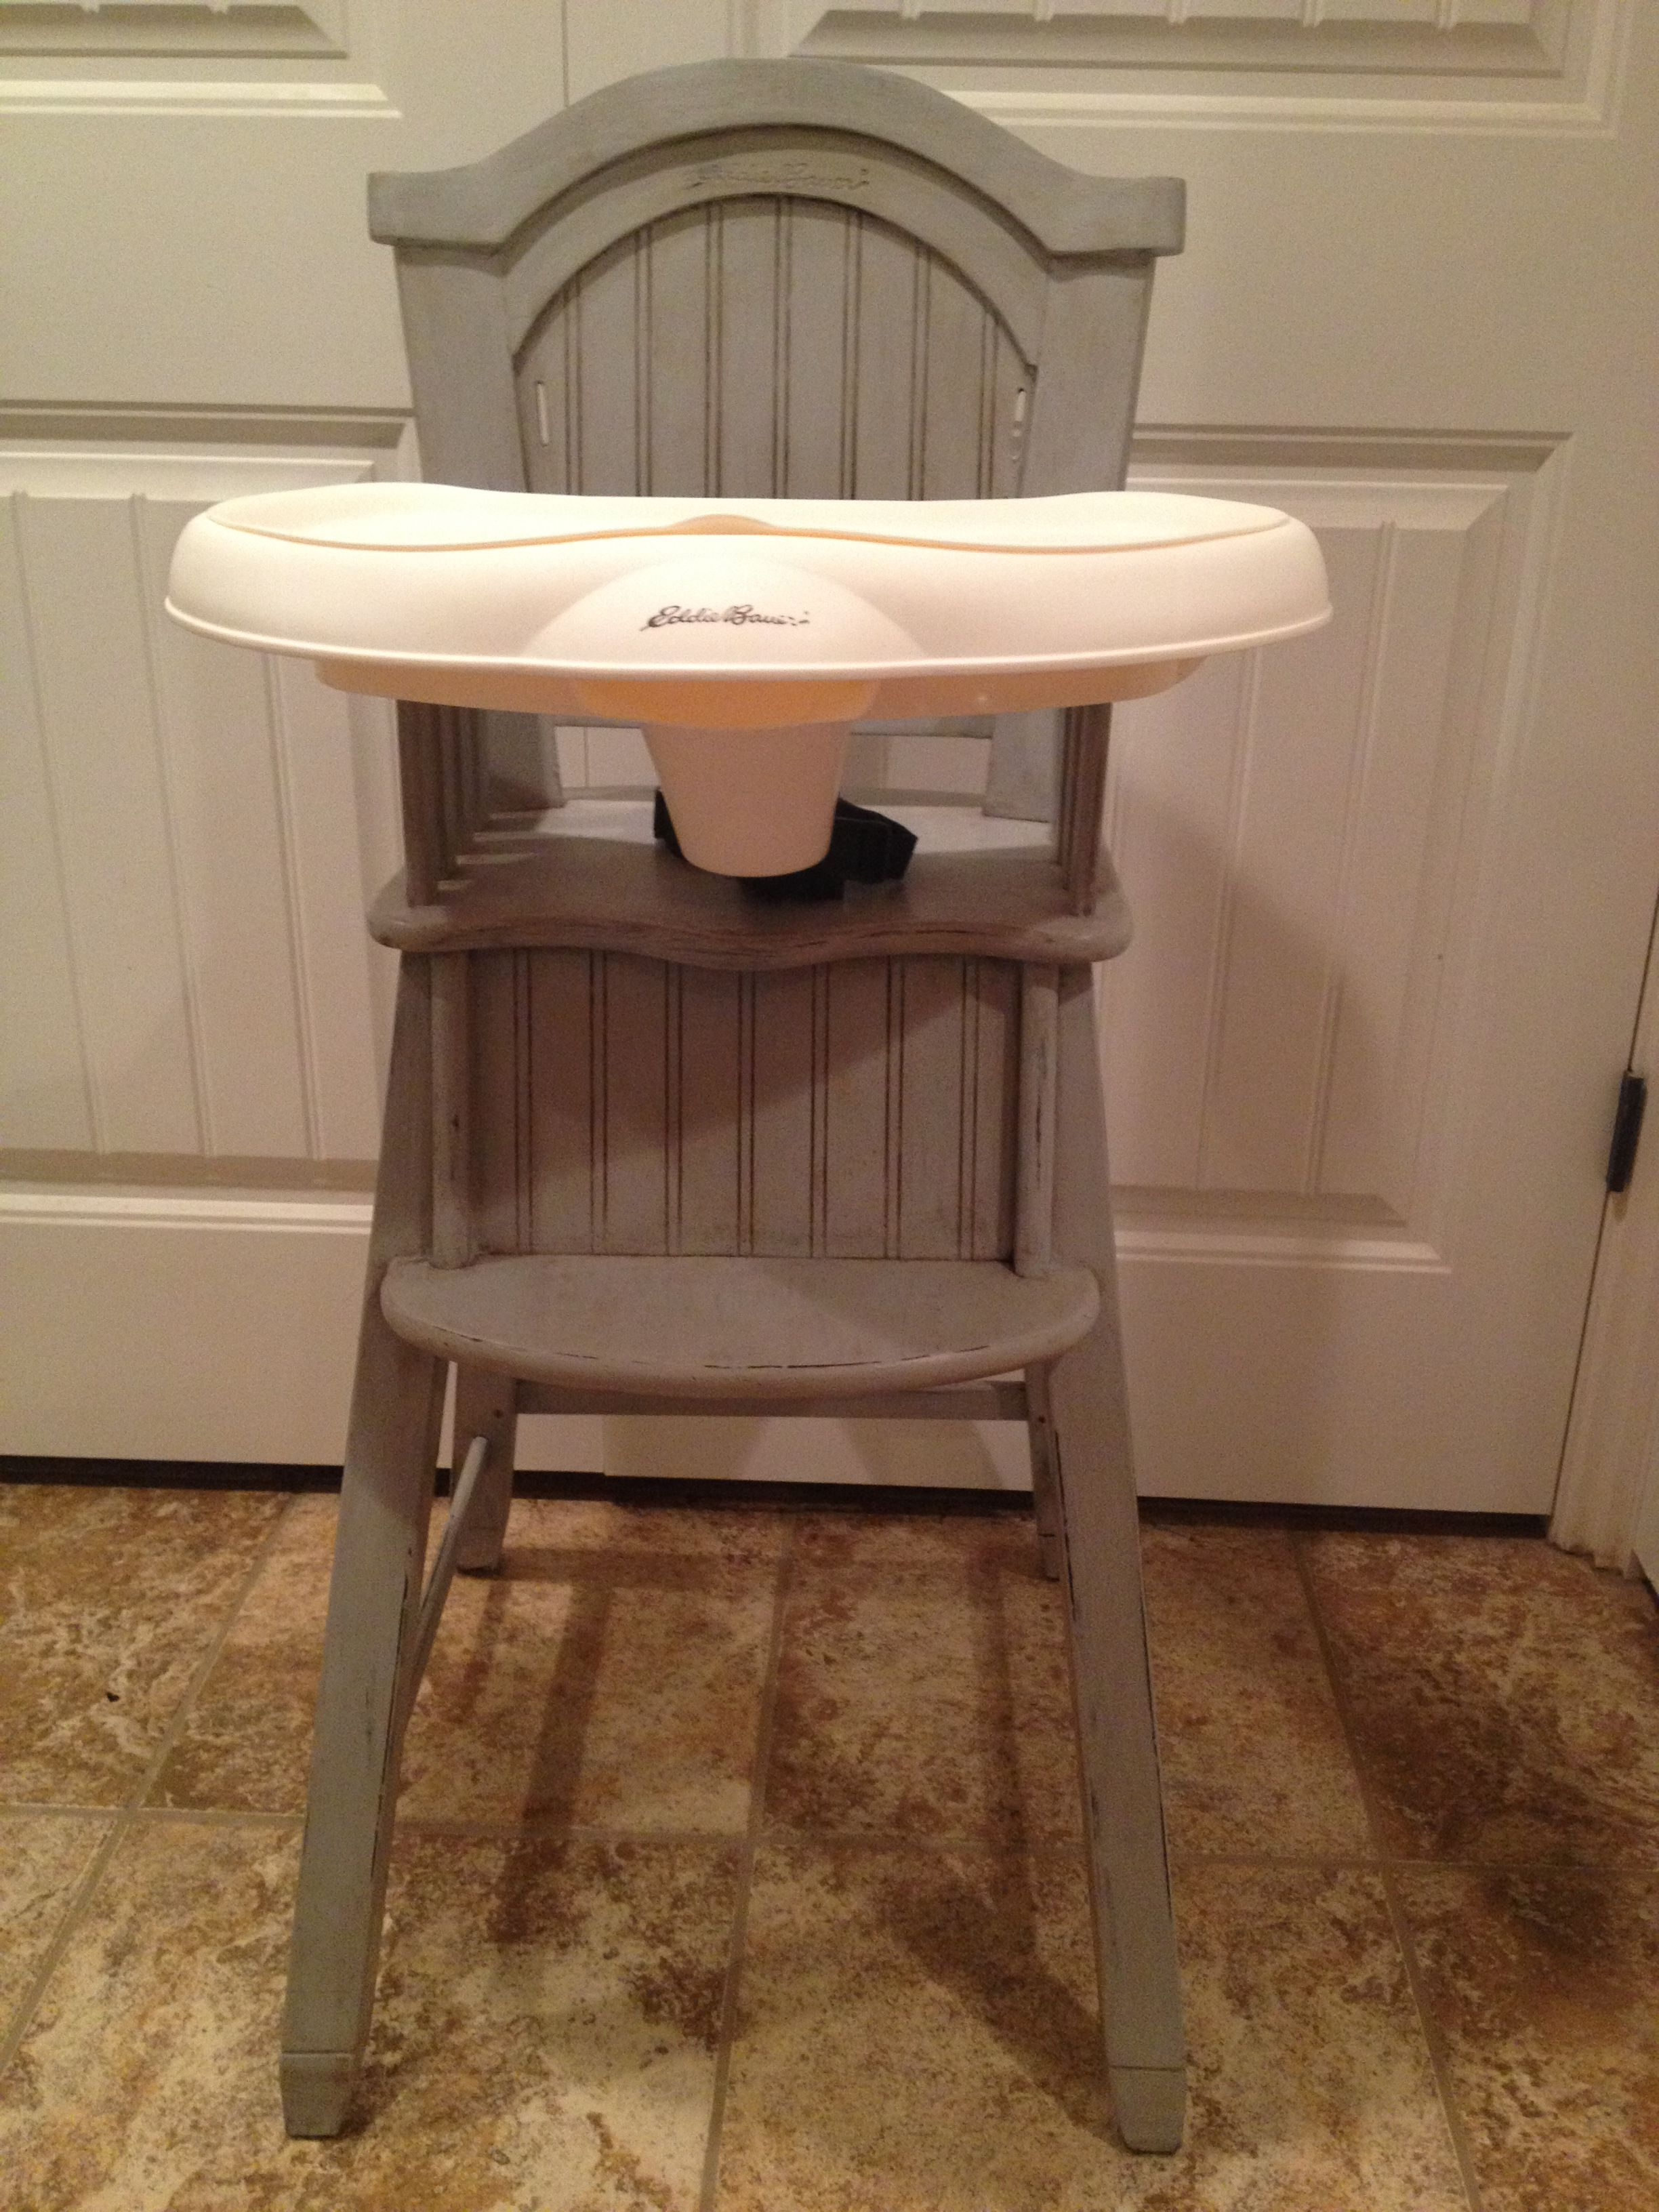 Eddie Bauer Wood High Chair U Shaped Legs Shabby Chic Chair. Paris Grey Annie Sloan Chalk Paint Distressed Then Coated ...